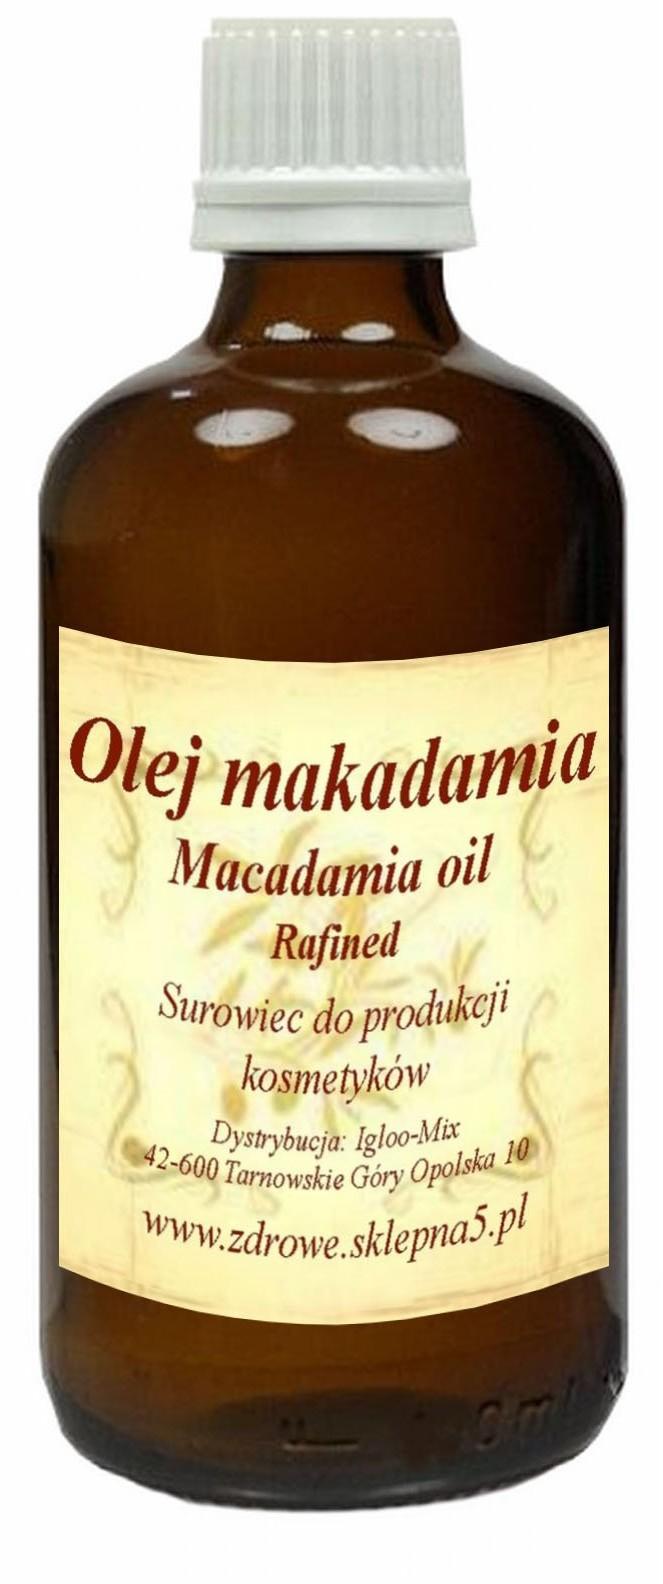 Olej Makadamia 250ml - Macadamia